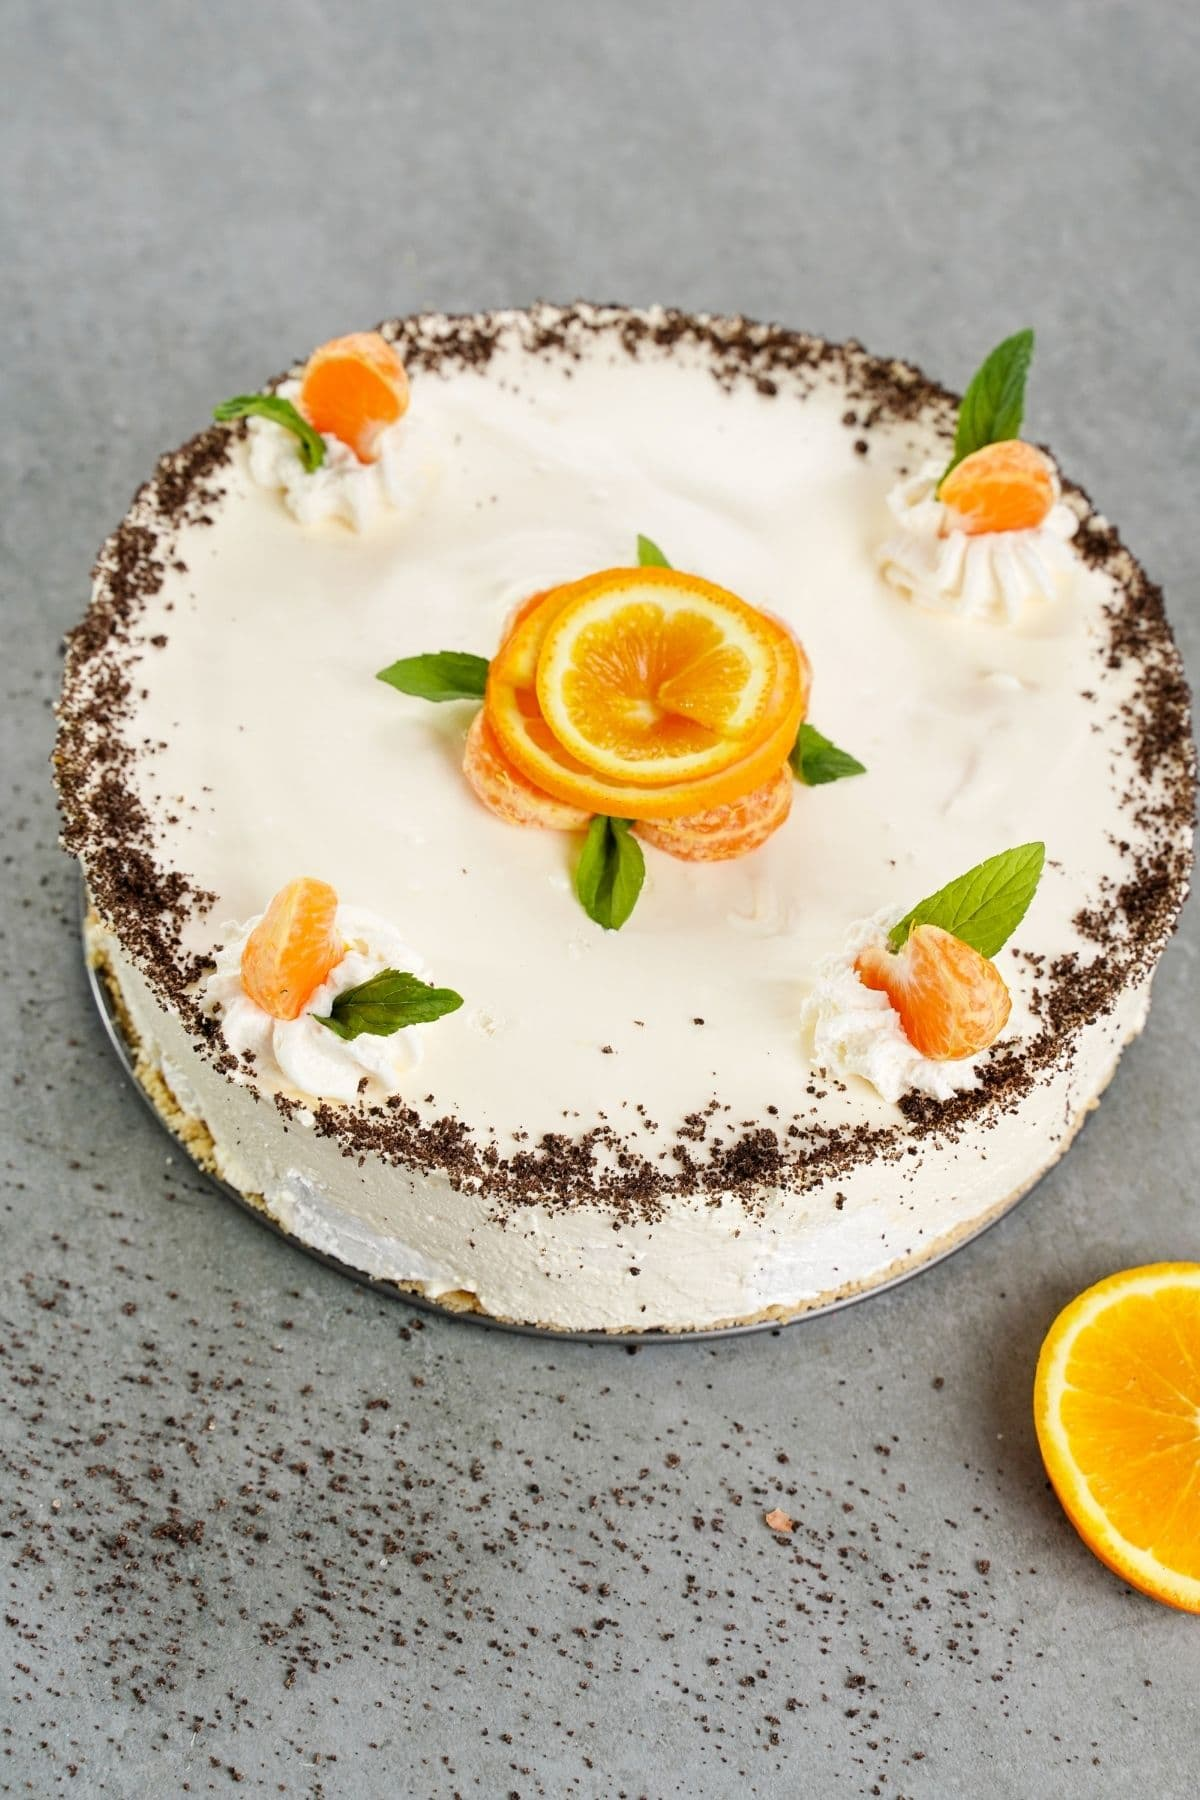 Whole cheesecake on gray table next to orange slices